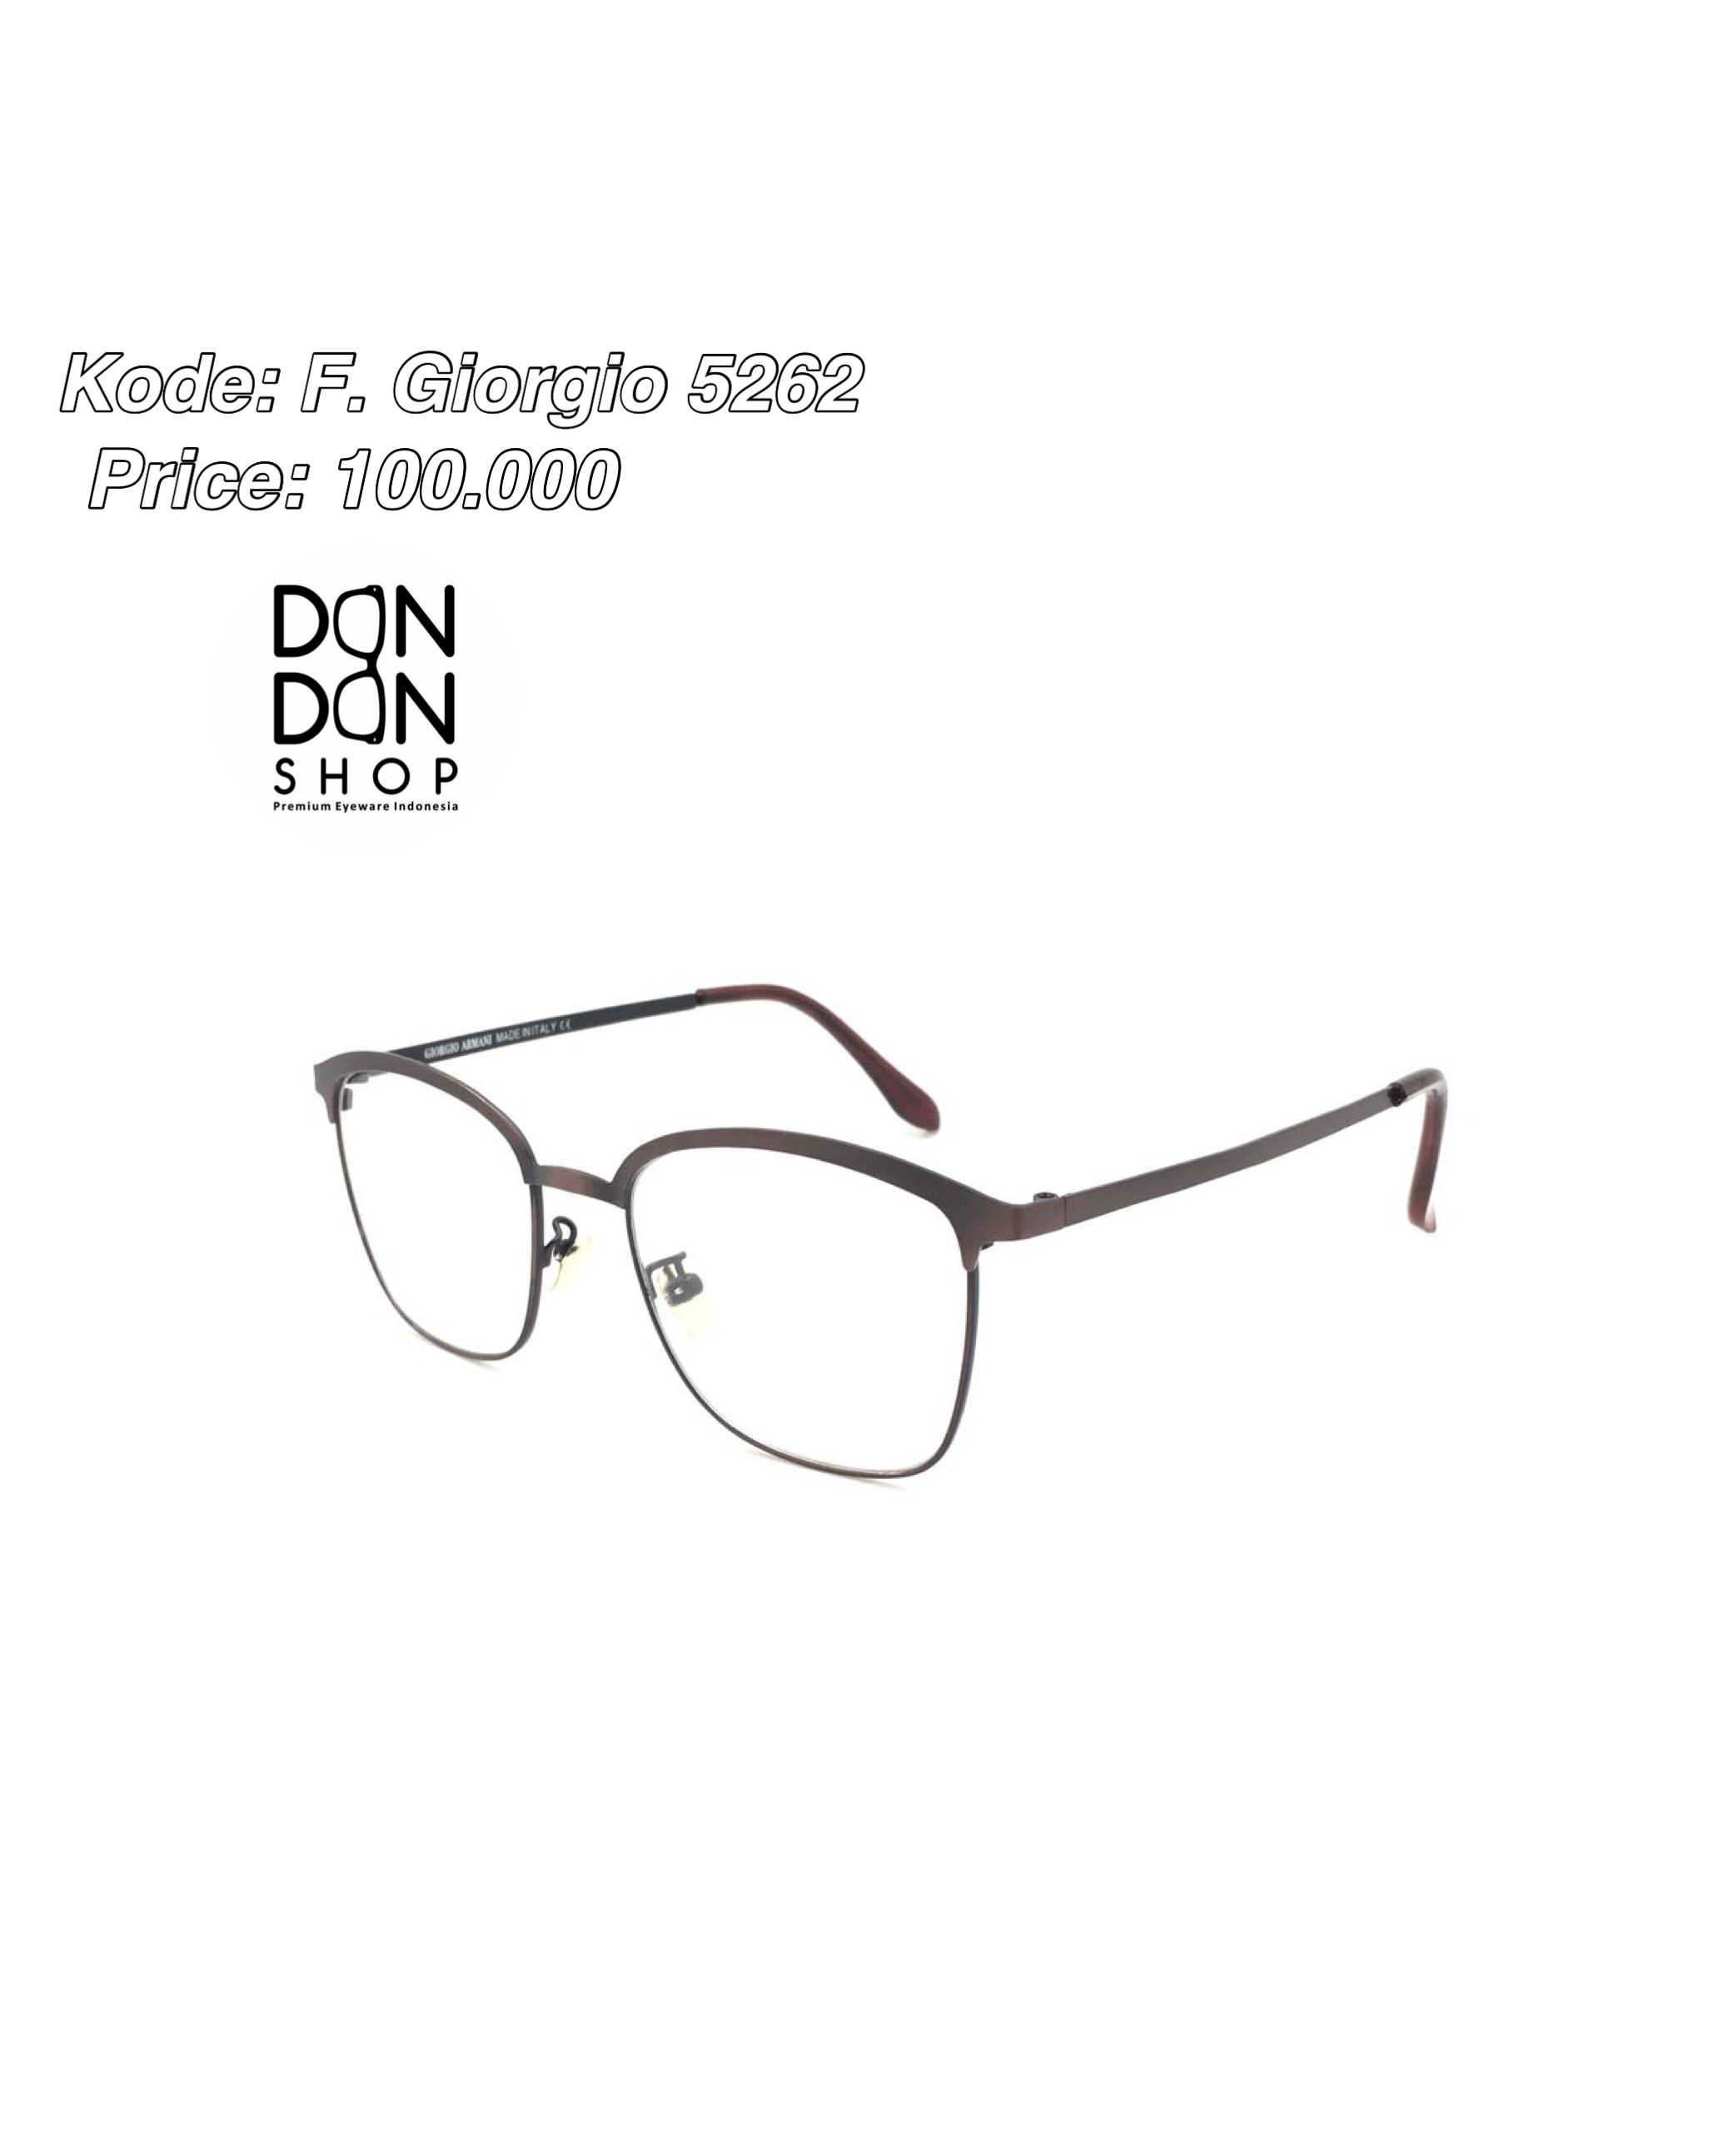 Kacamata Anti Silau Lipat Hd Vision Fold Always Free Sarung Cek Malam Kuning Night View Glasses Sj0038 Serbaguna Source Korea Kacamataminus